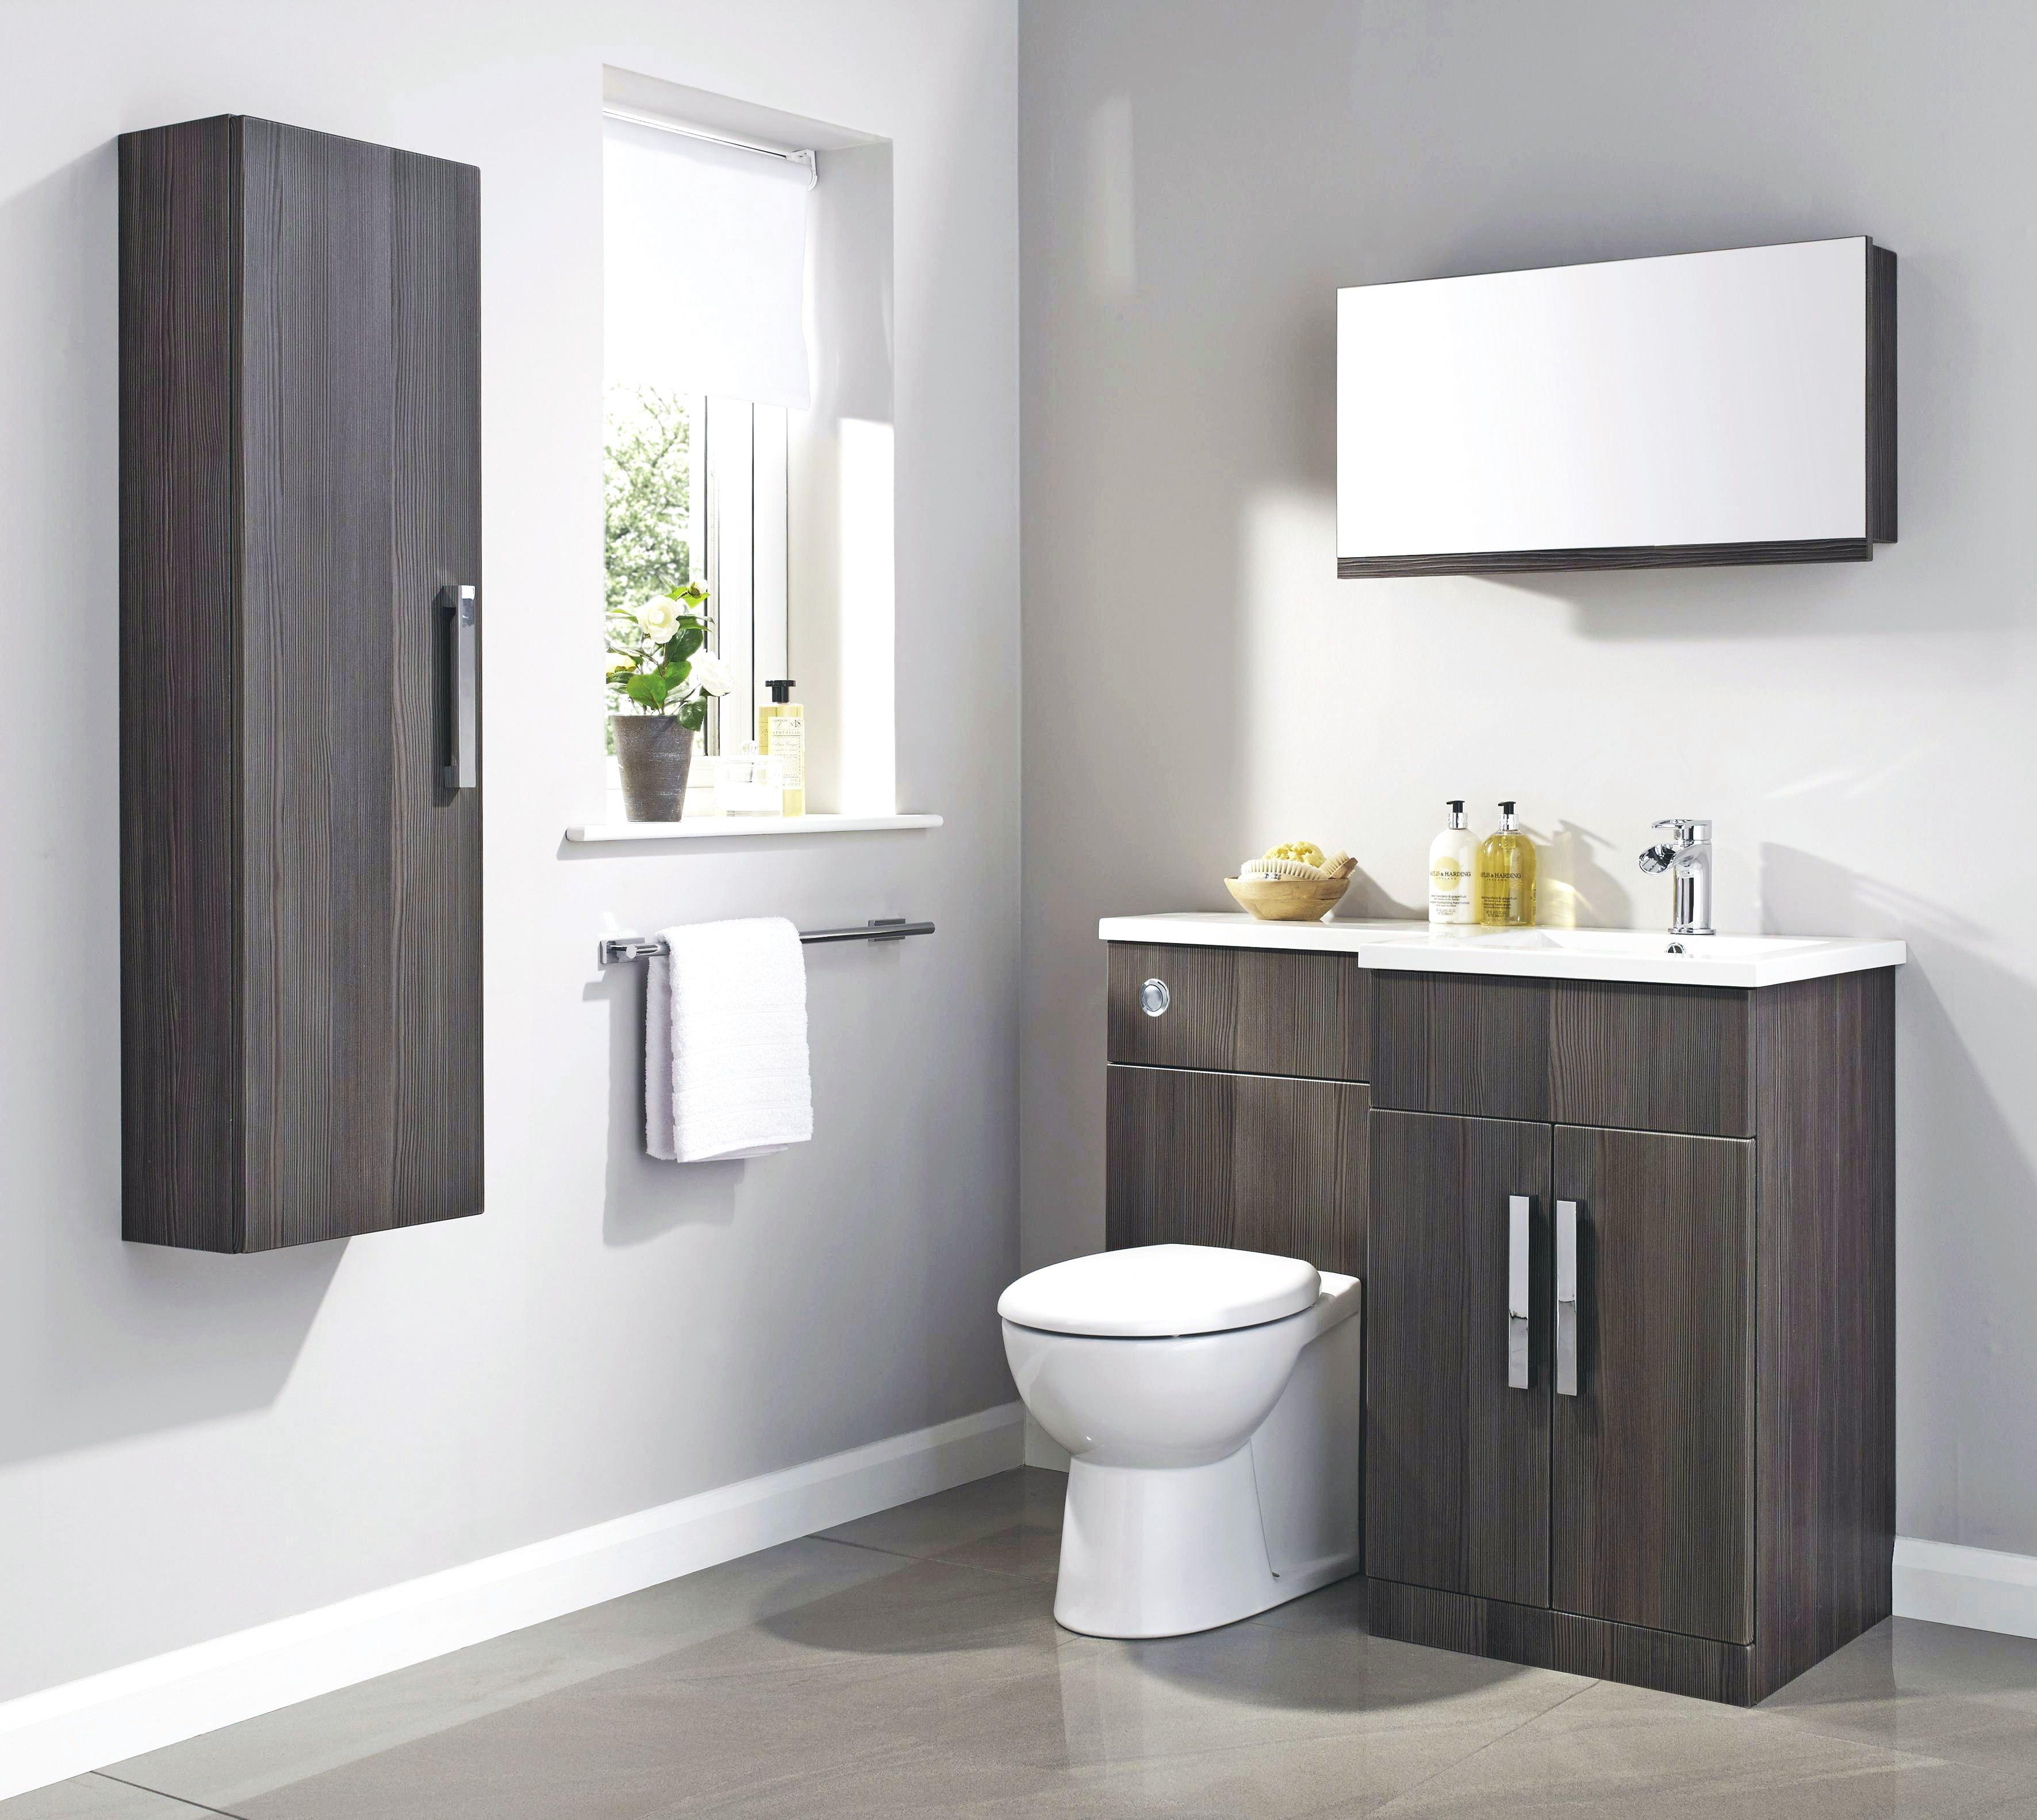 Bathroom Furniture & Cabinets | Bathroom Storage, Vanities & Units